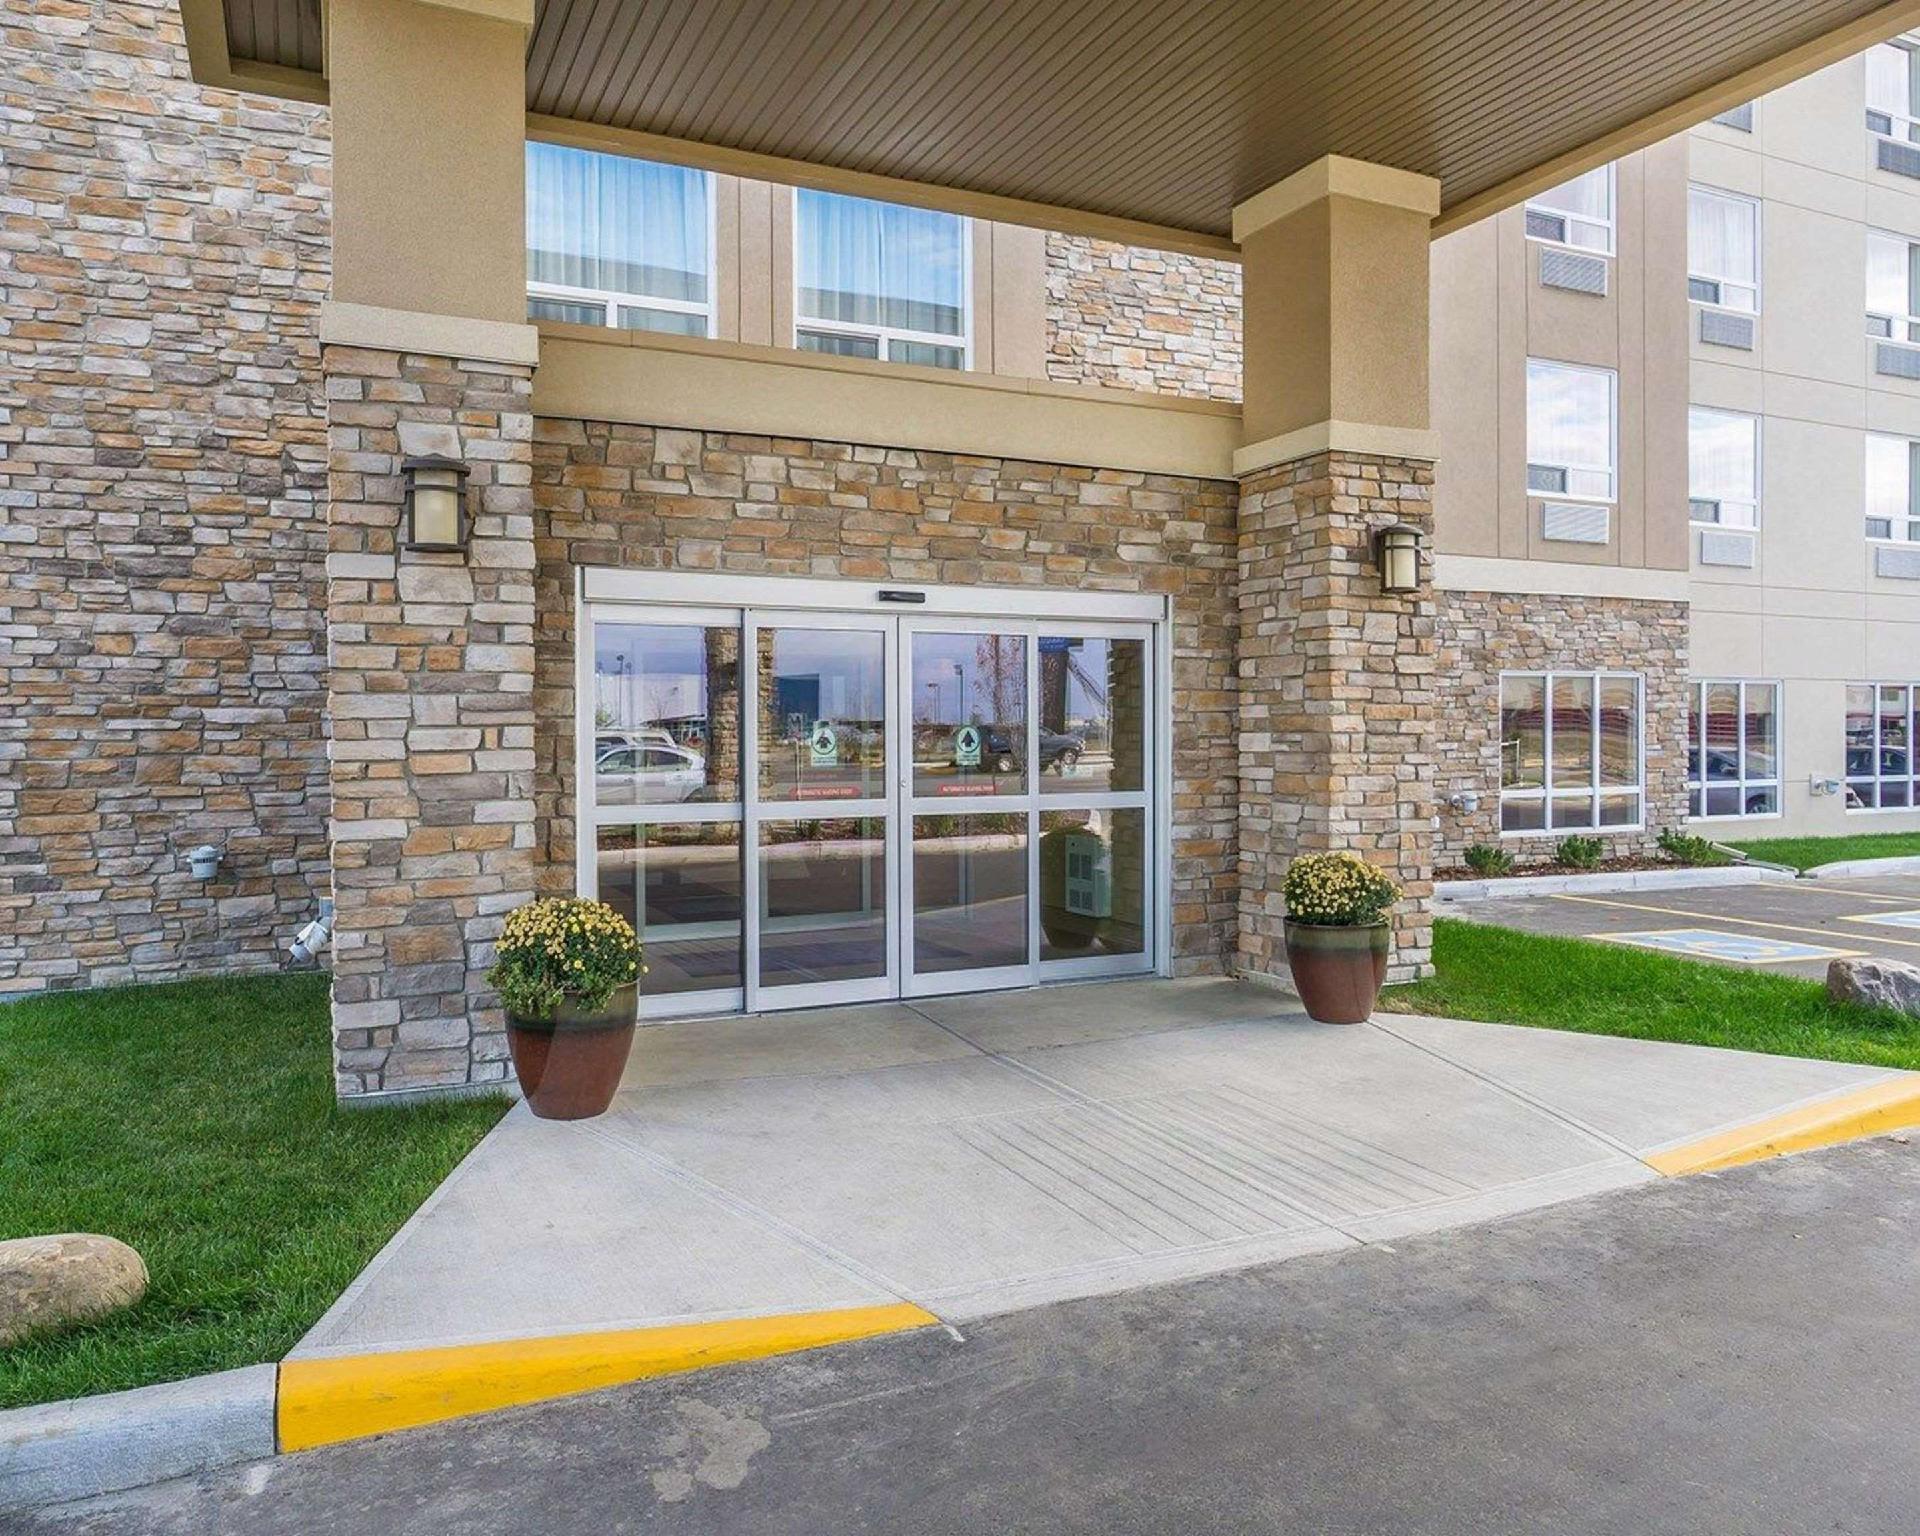 Comfort Inn & Suites Edmonton International Airport, Division No. 11